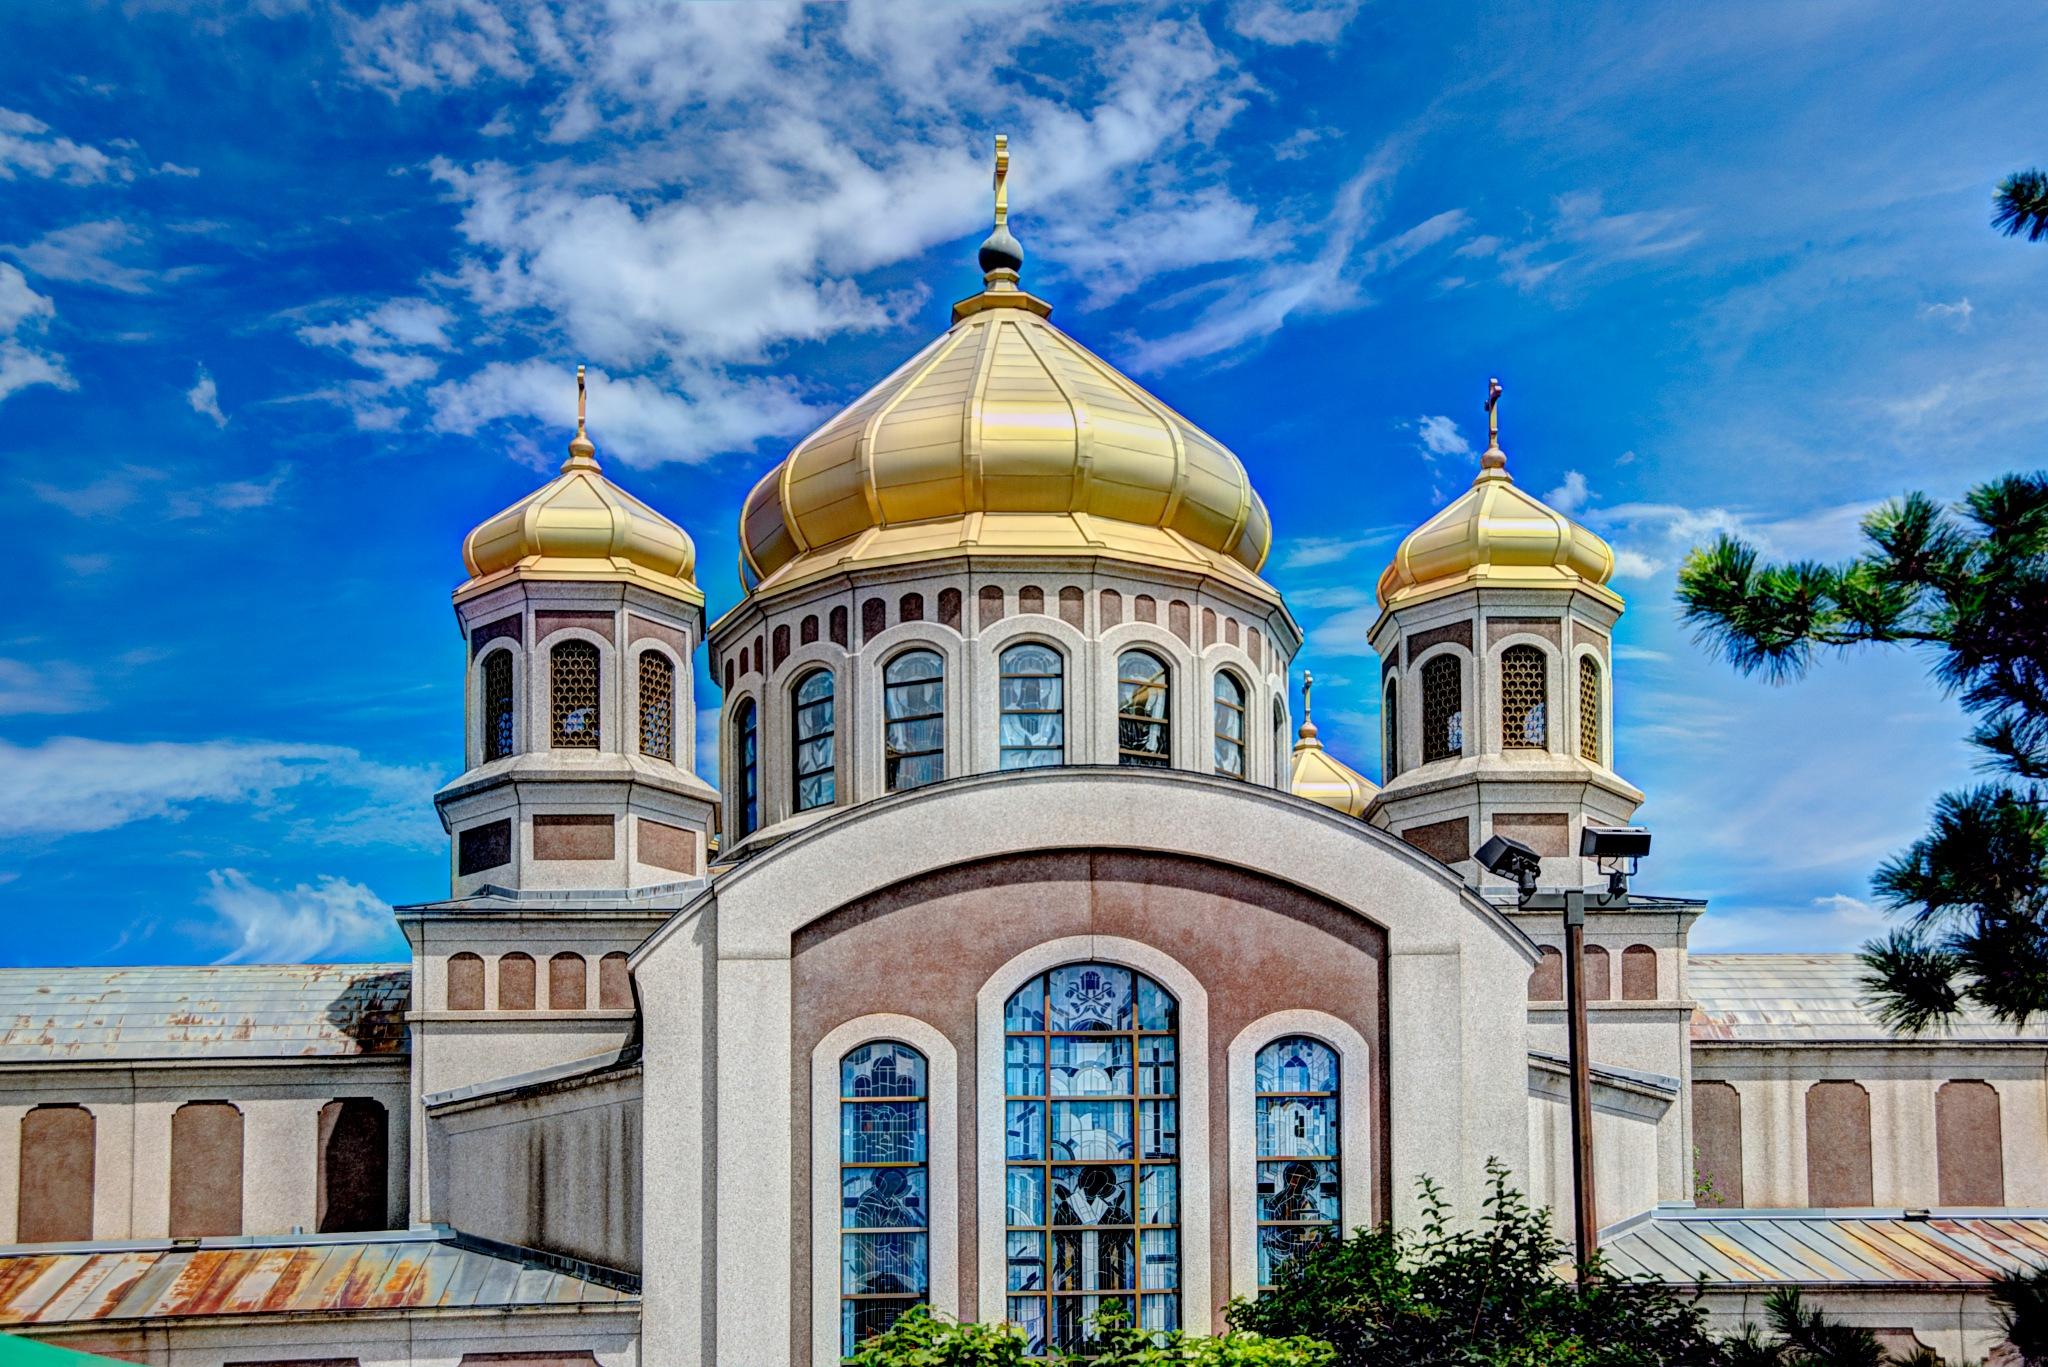 St. John The Baptist Ukrainian Catholic Church by Paul Deveau